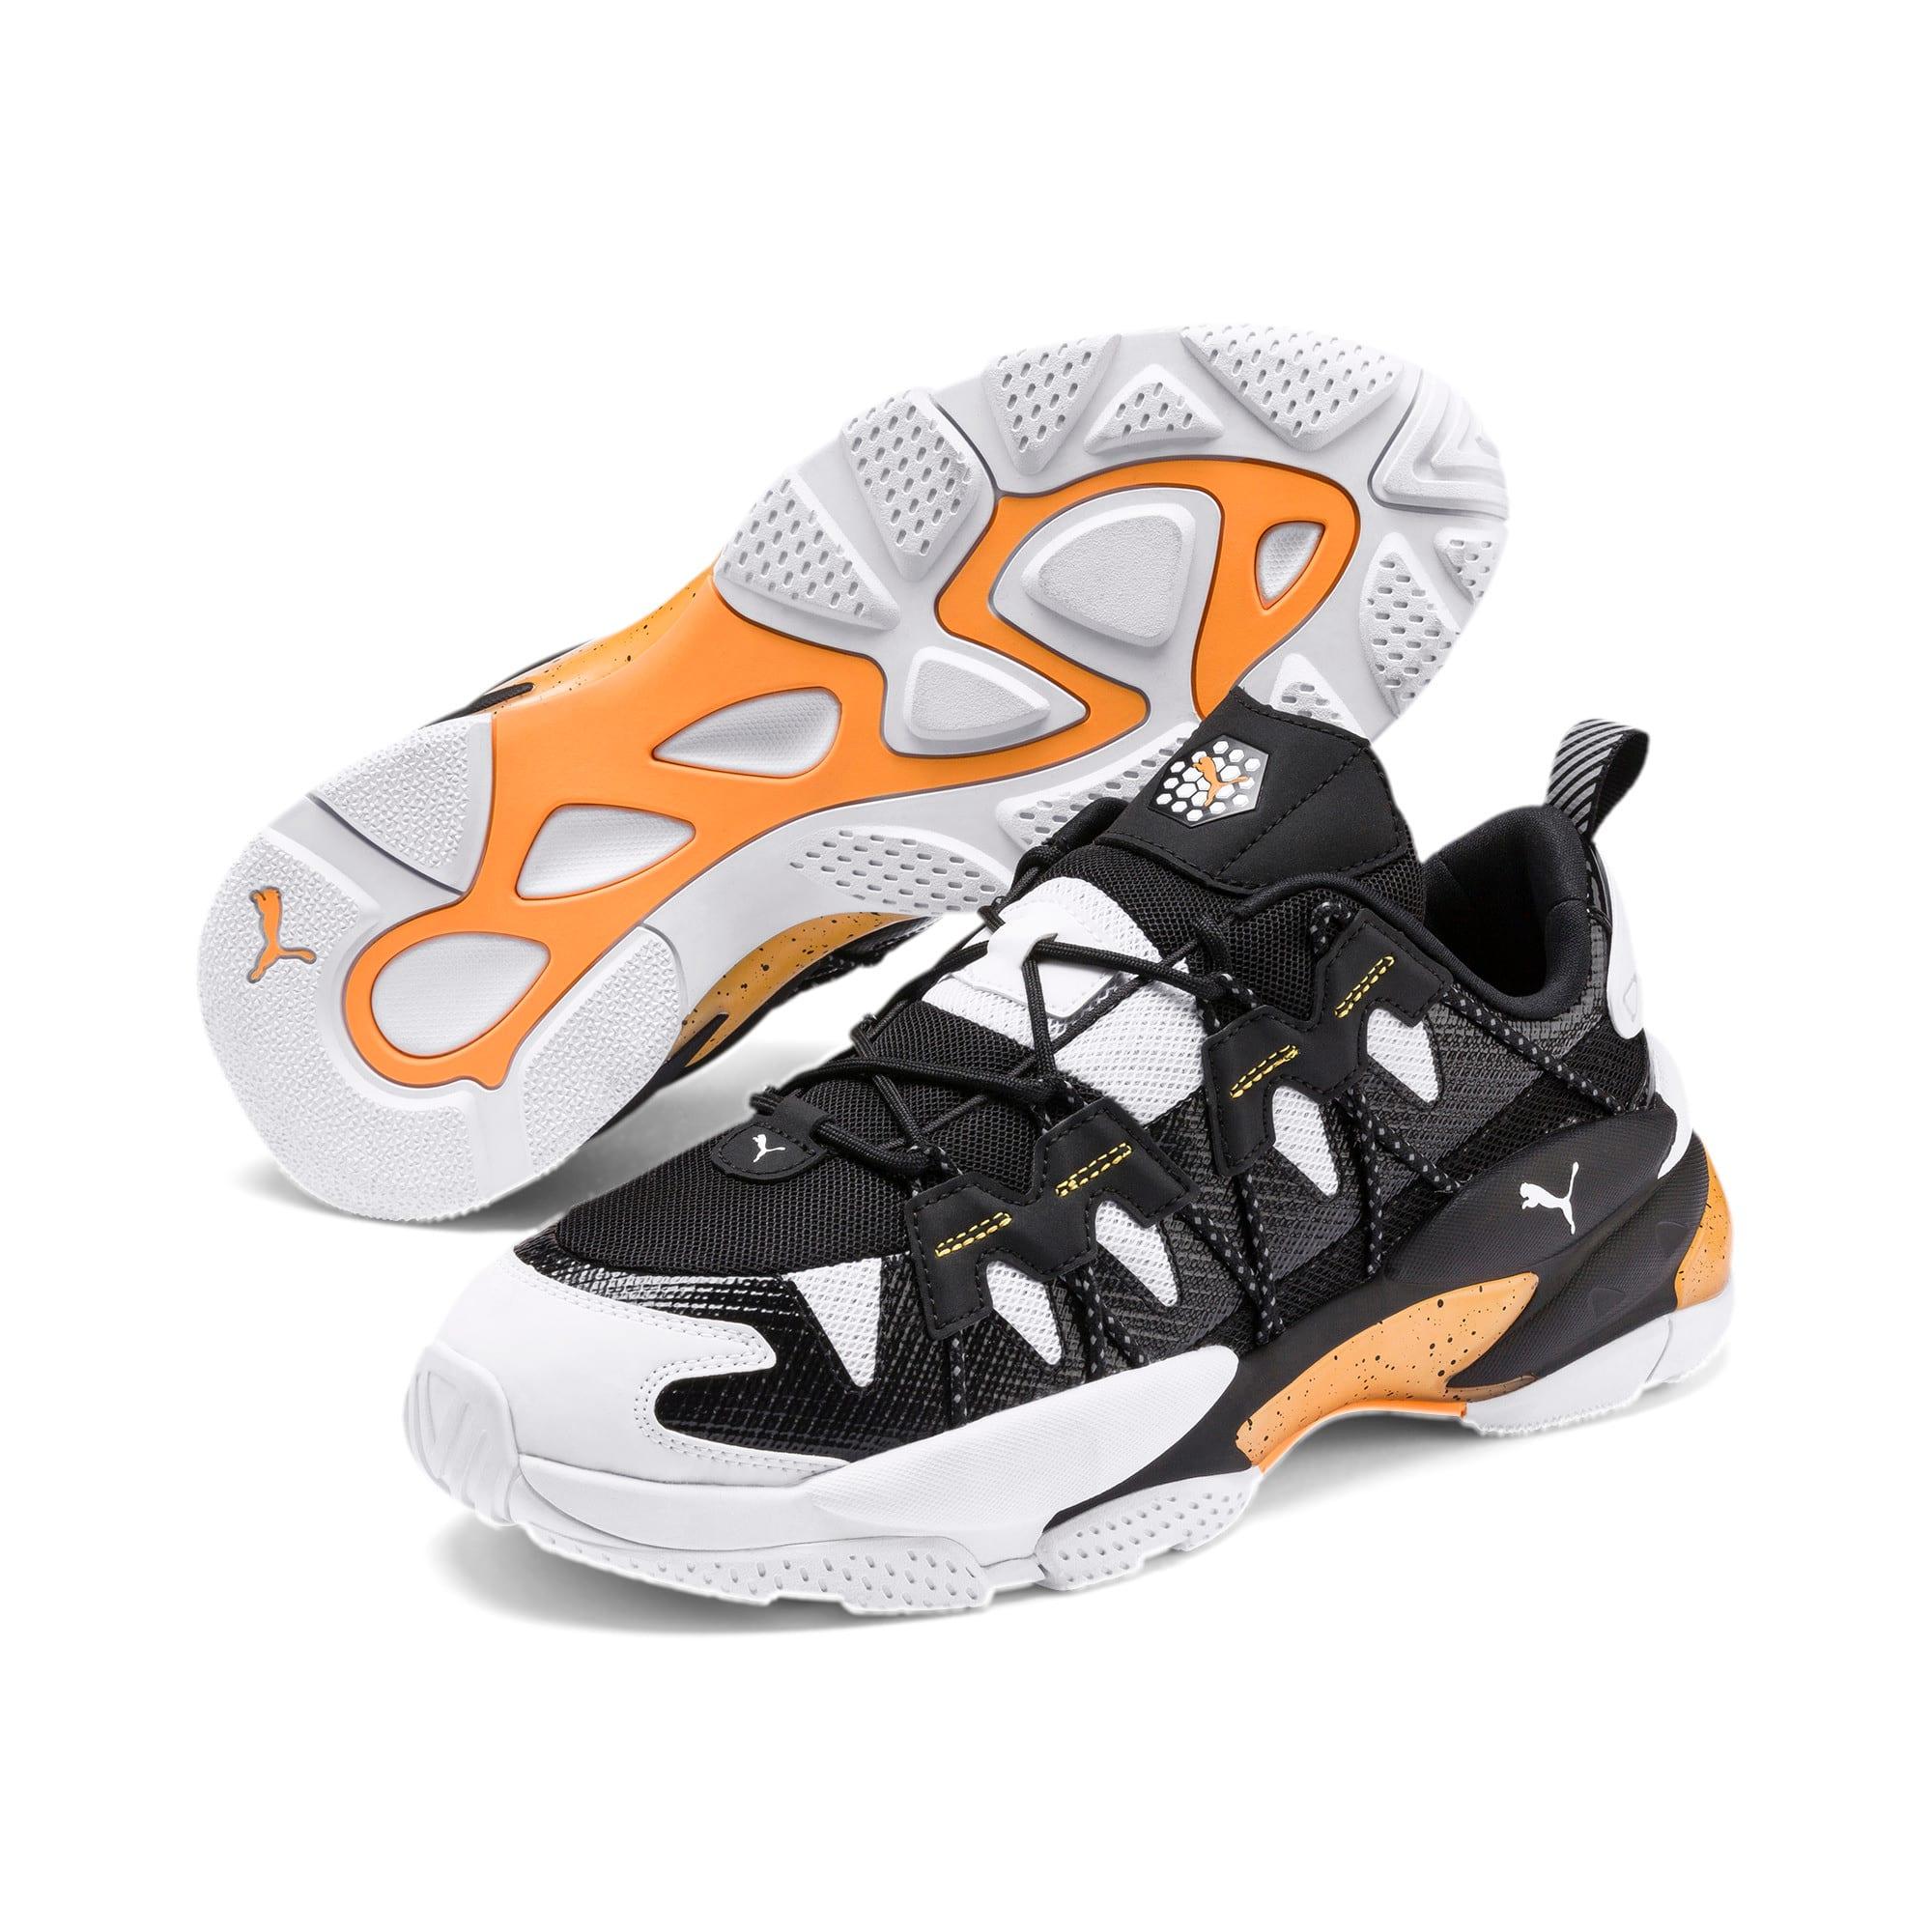 Thumbnail 2 of LQDCELL Omega Density Training Shoes, Puma White-Puma Black, medium